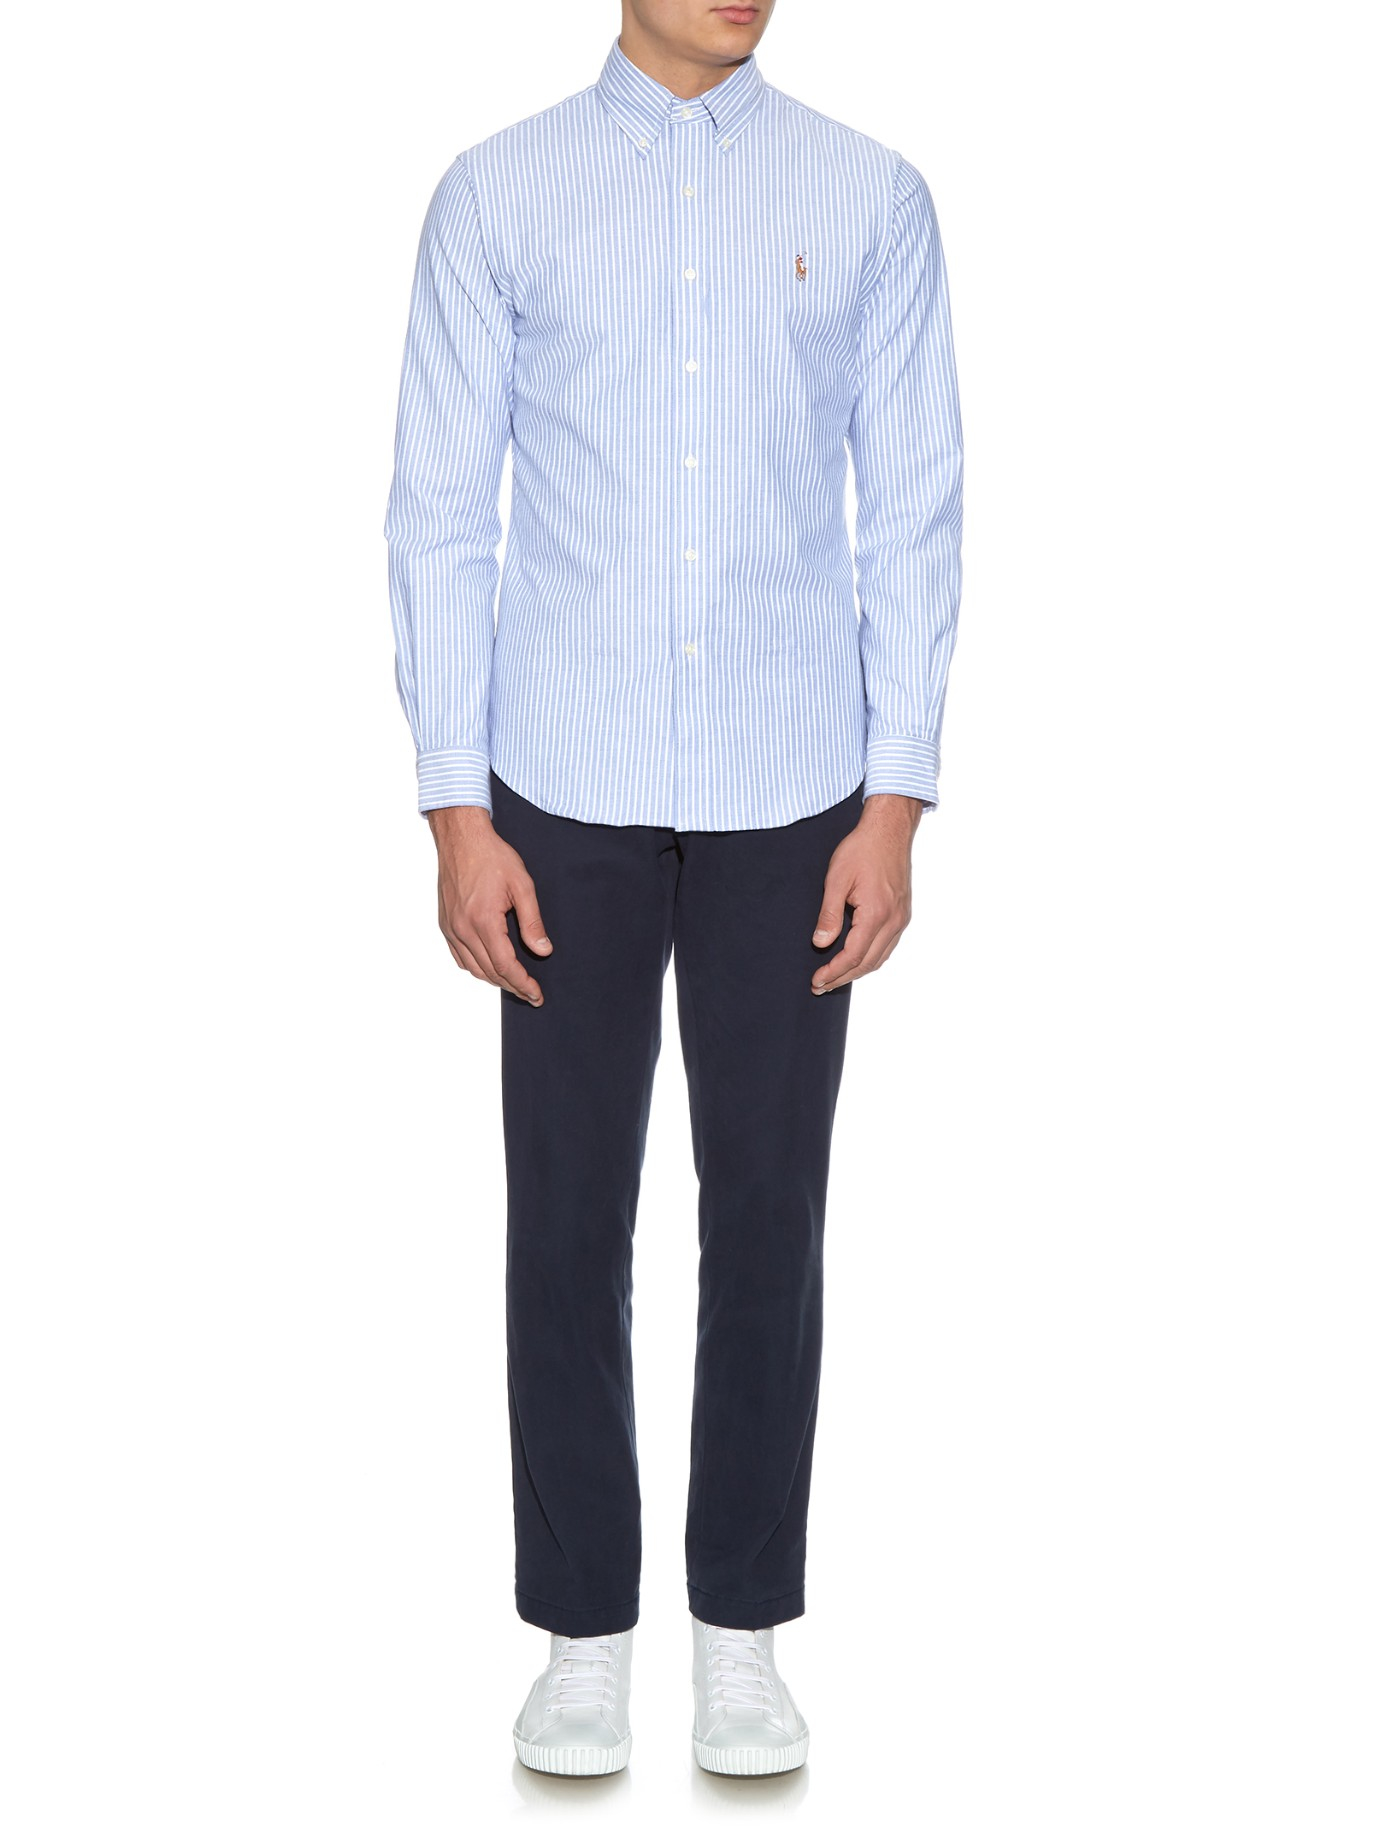 e4a8622b480 Lyst - Polo Ralph Lauren Striped Cotton Oxford-blend Shirt in Blue ...